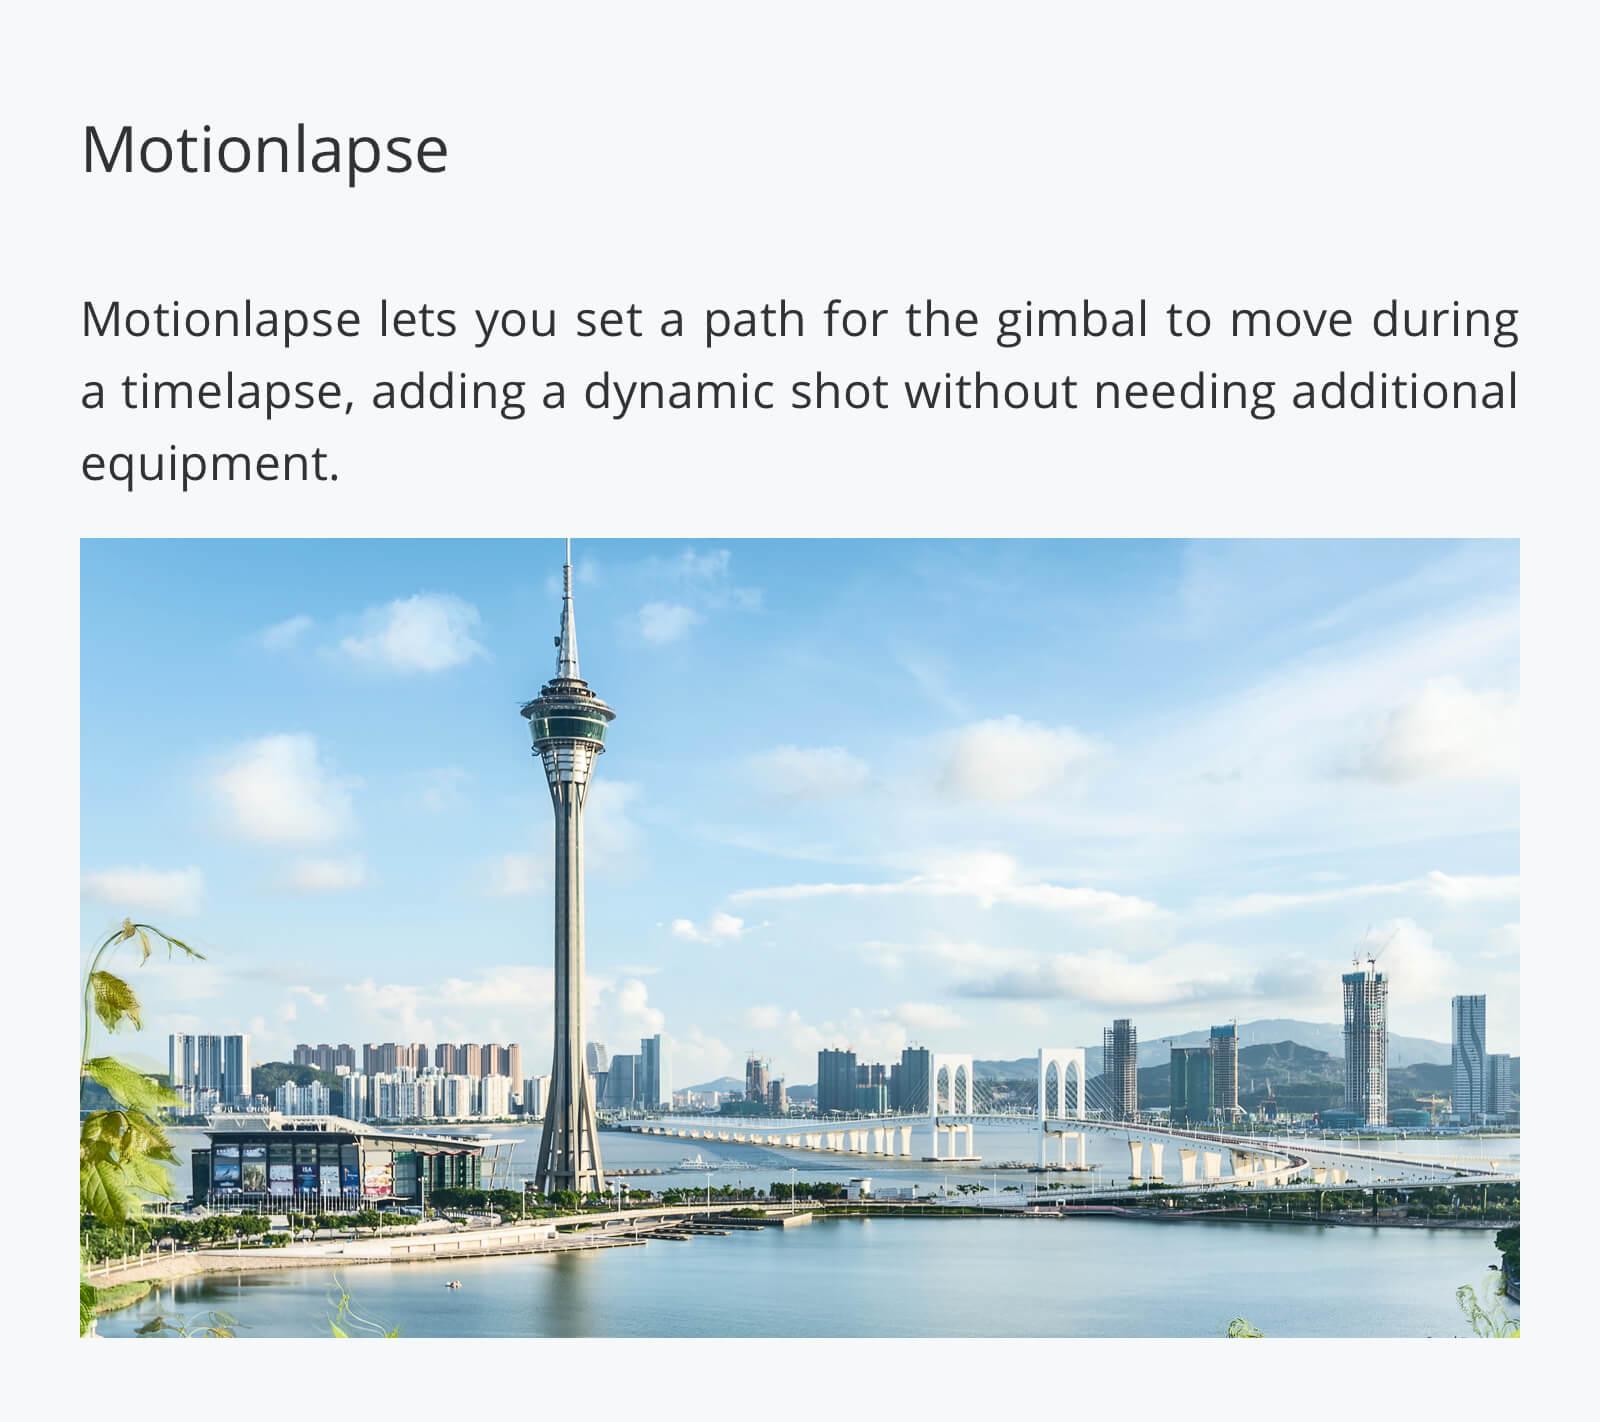 Ronin-S Motionlapse